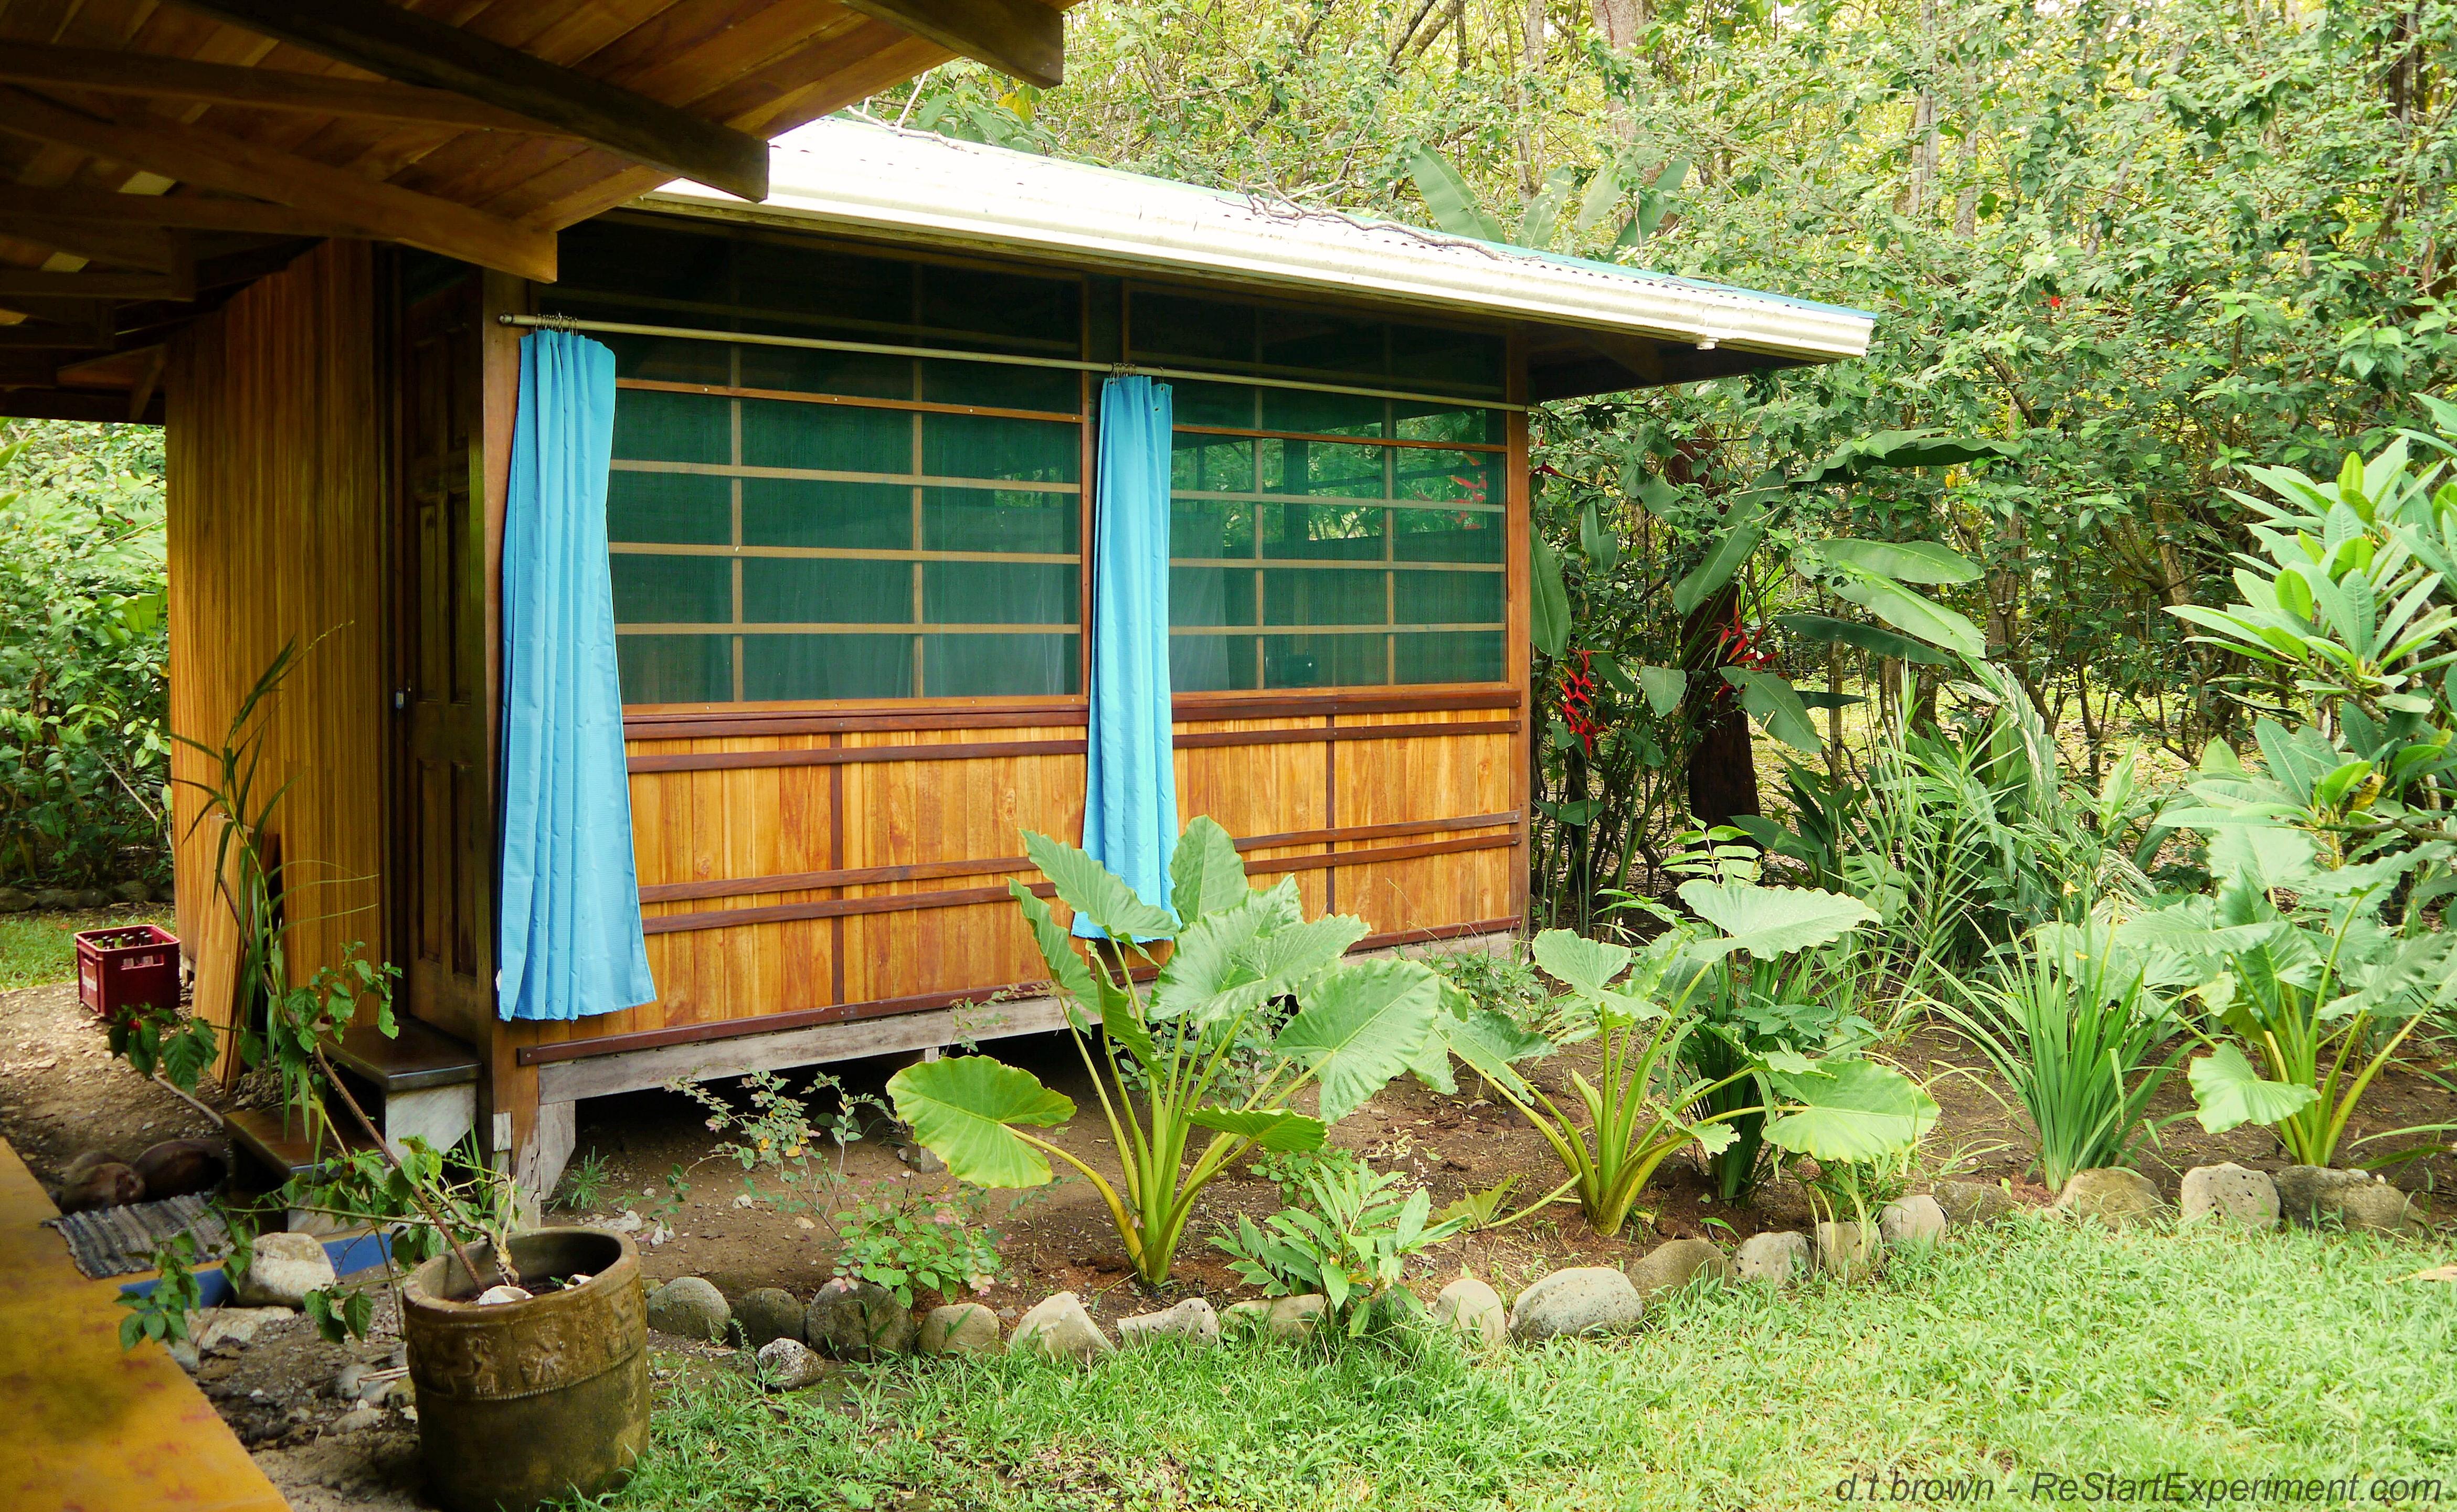 Minimalist Cabin how i live, part 1 / where i live | the restart experiment